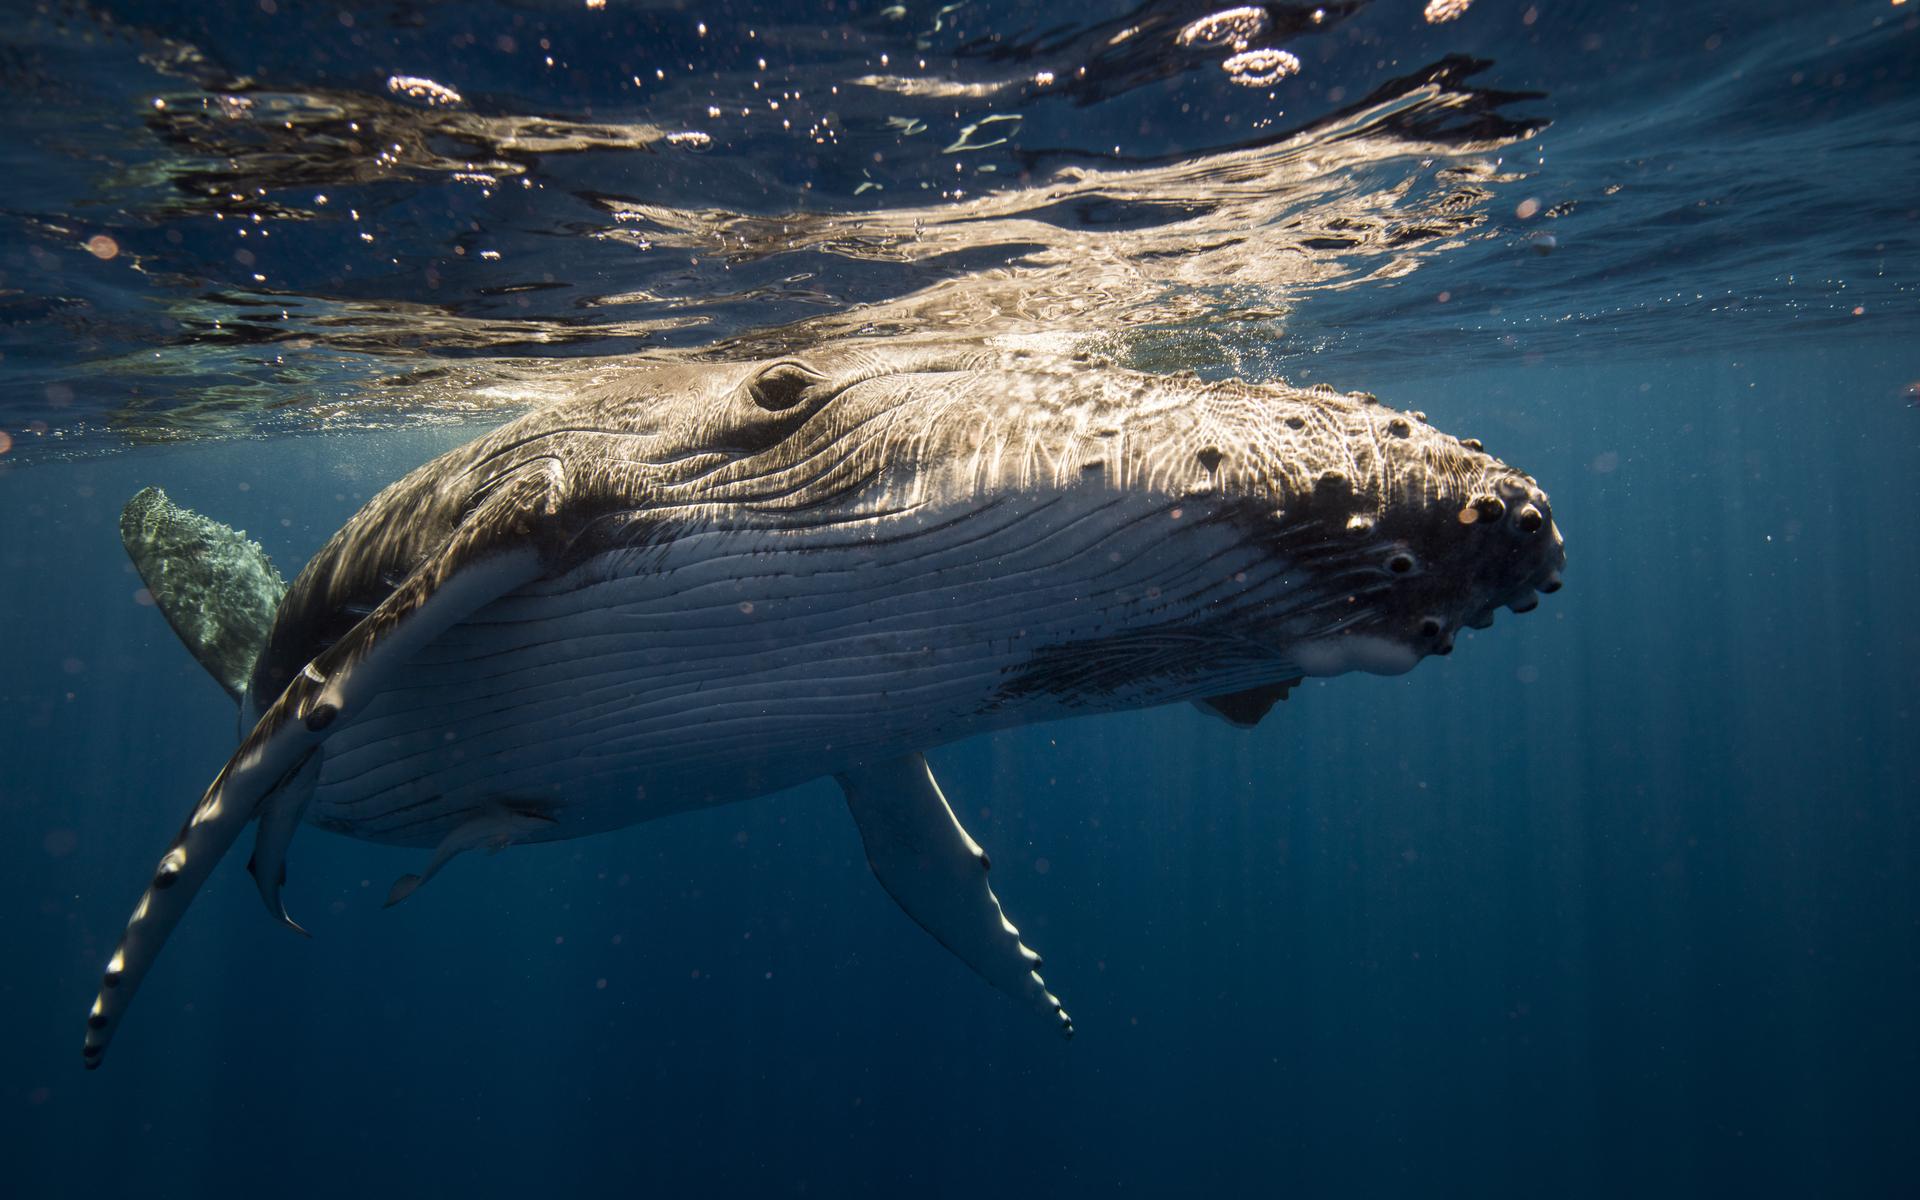 bitcoin crashes as whale dumps on Huobi